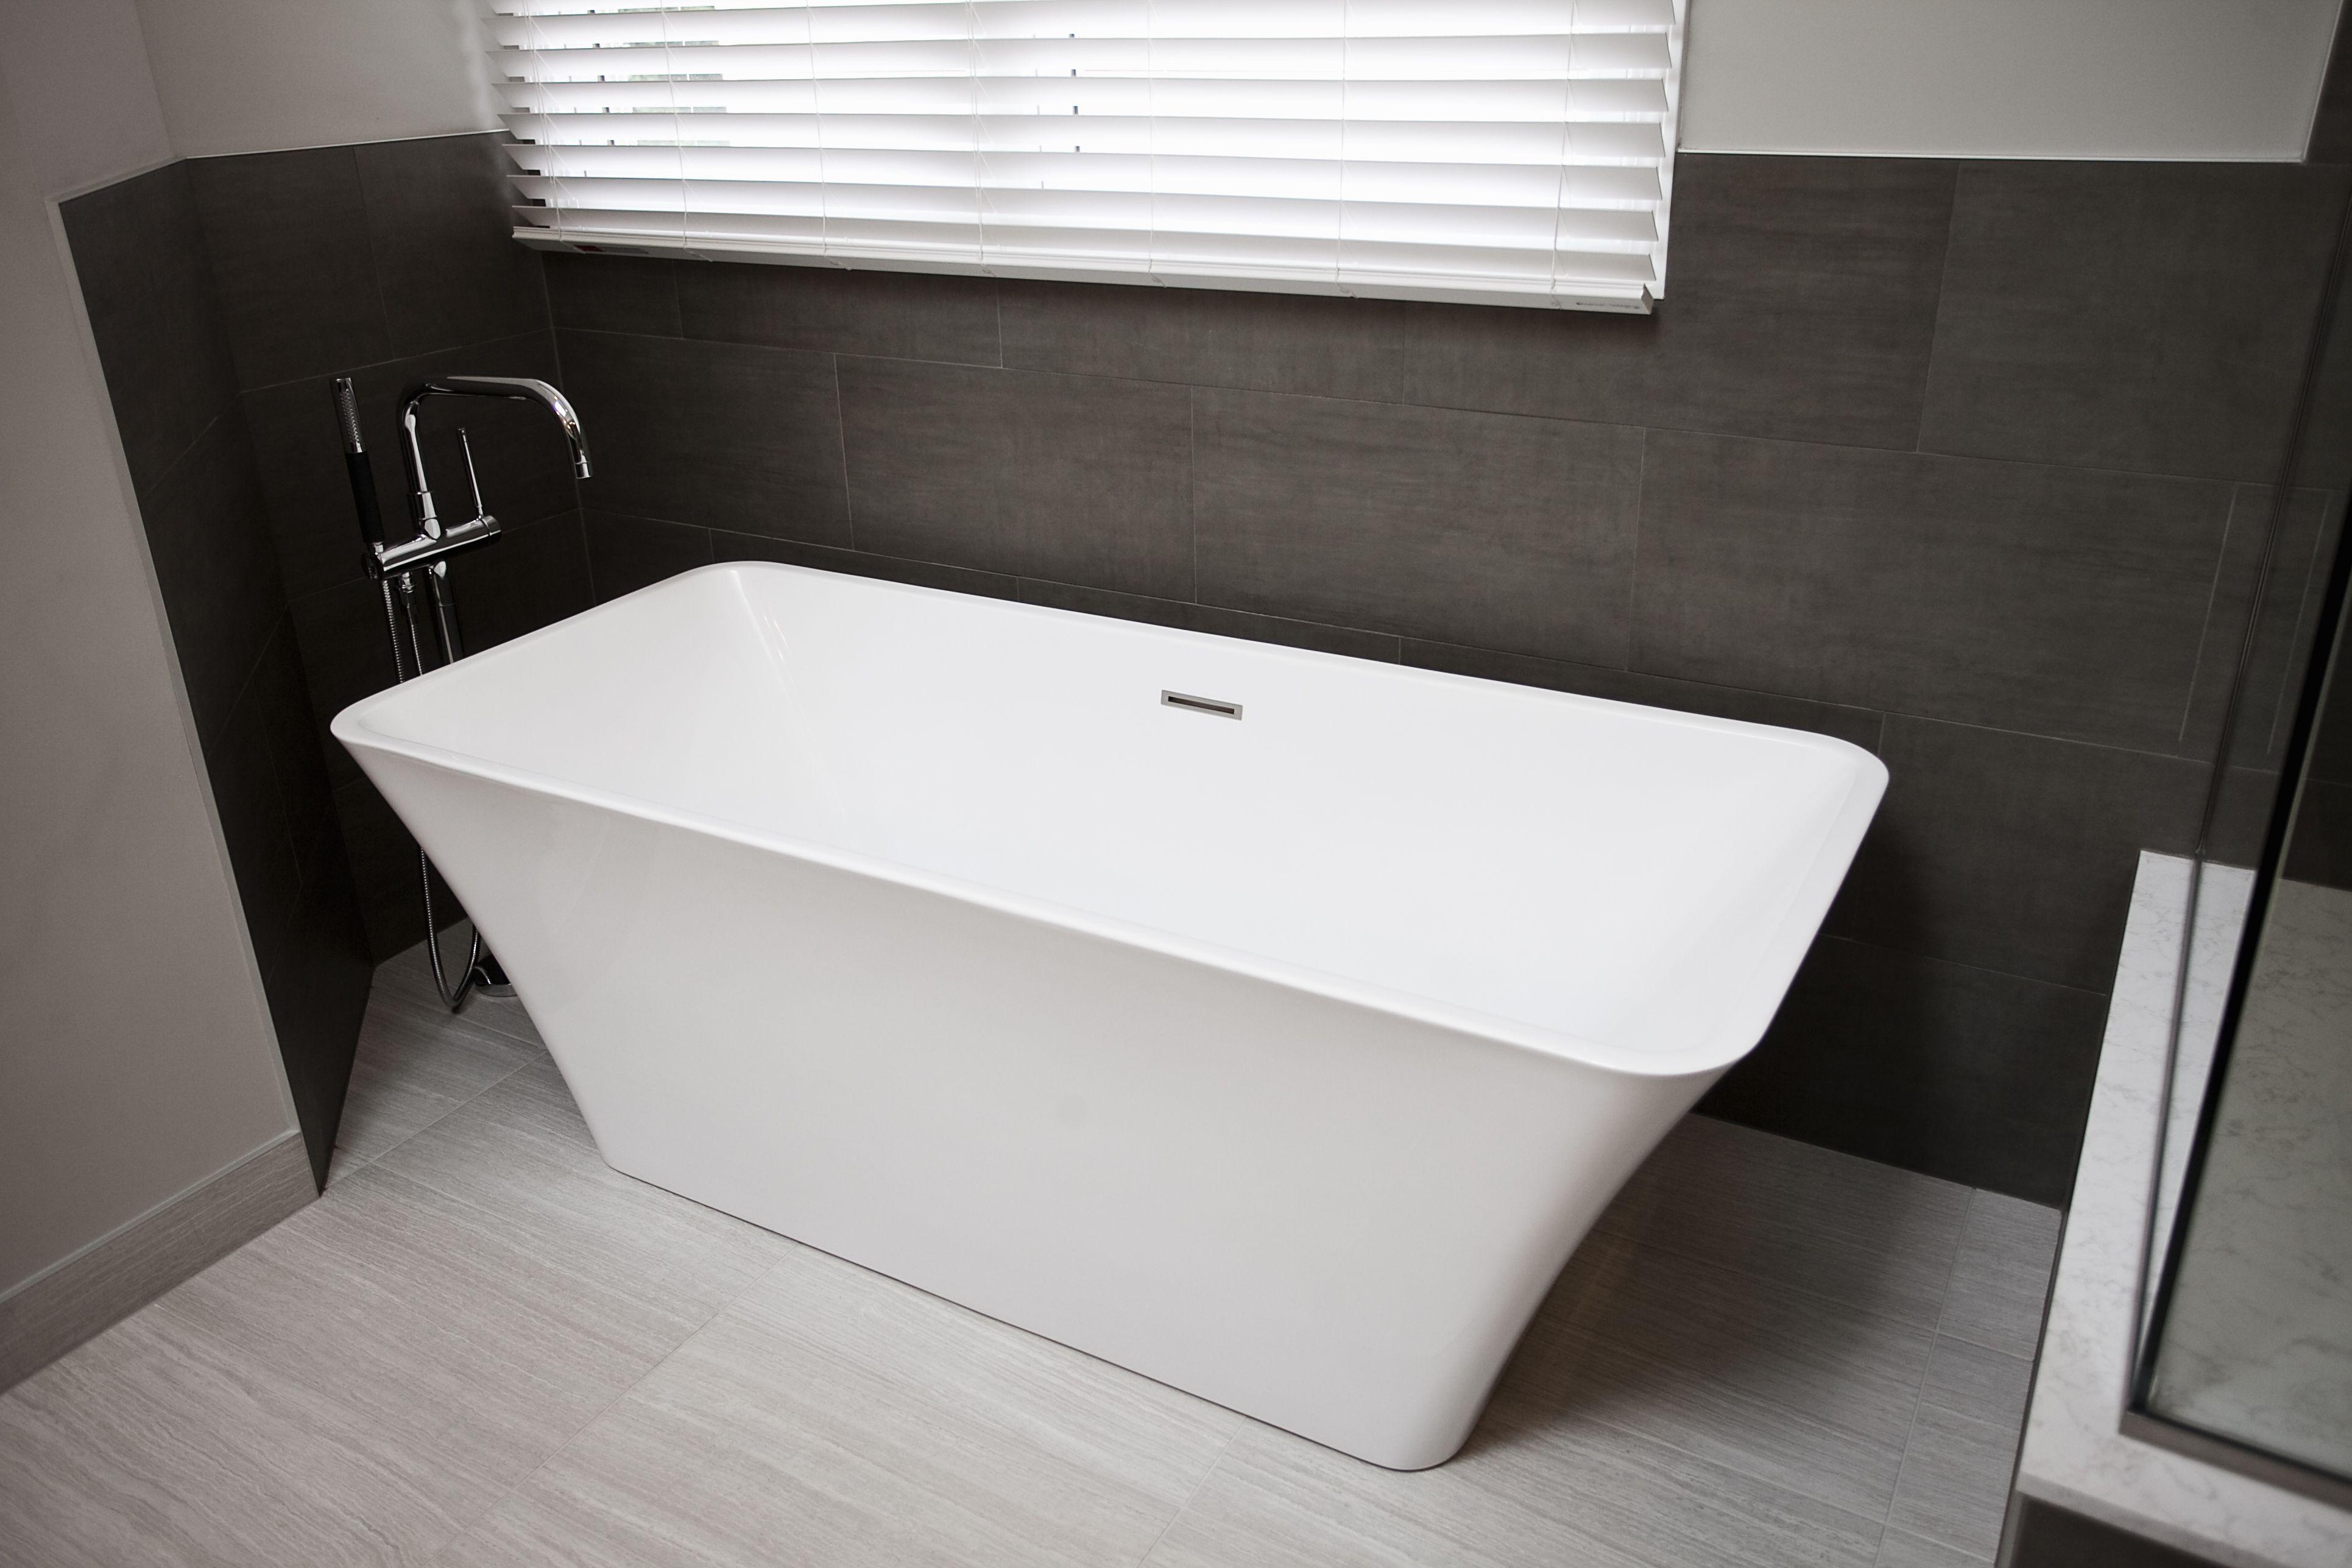 Bath Masters Naperville contemporary naperville master bath. soaking tub, large format